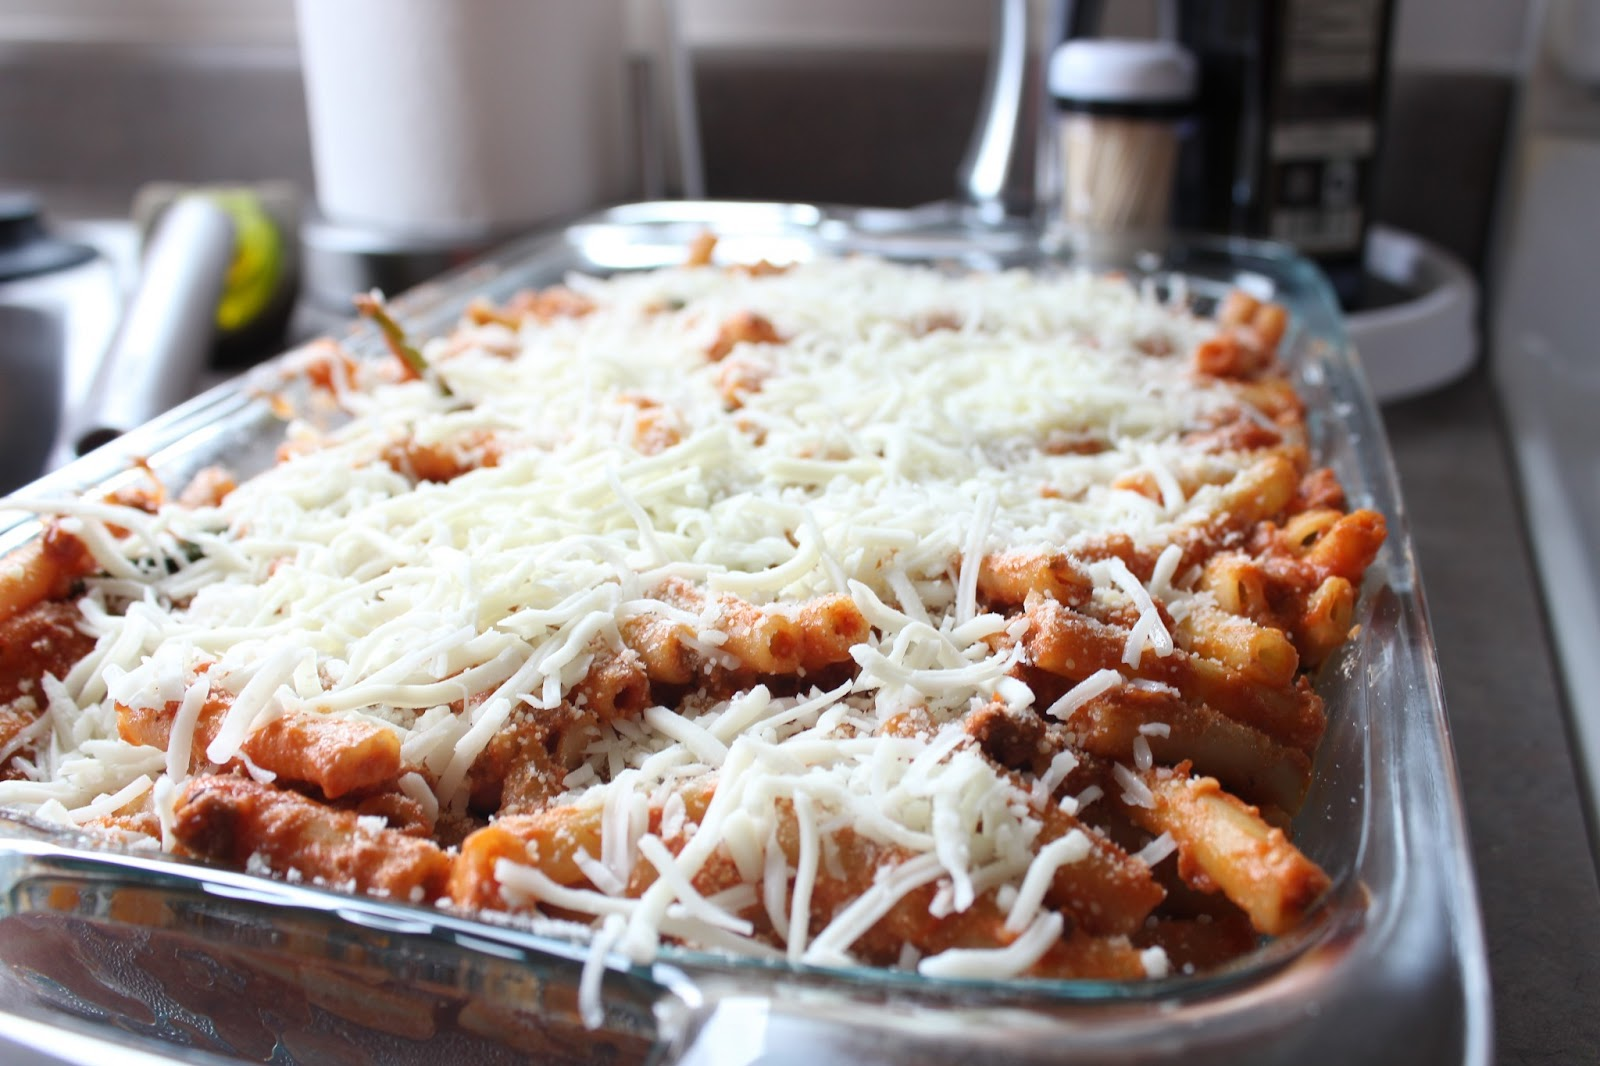 Married to Davis: Lasagna-Style Baked Ziti